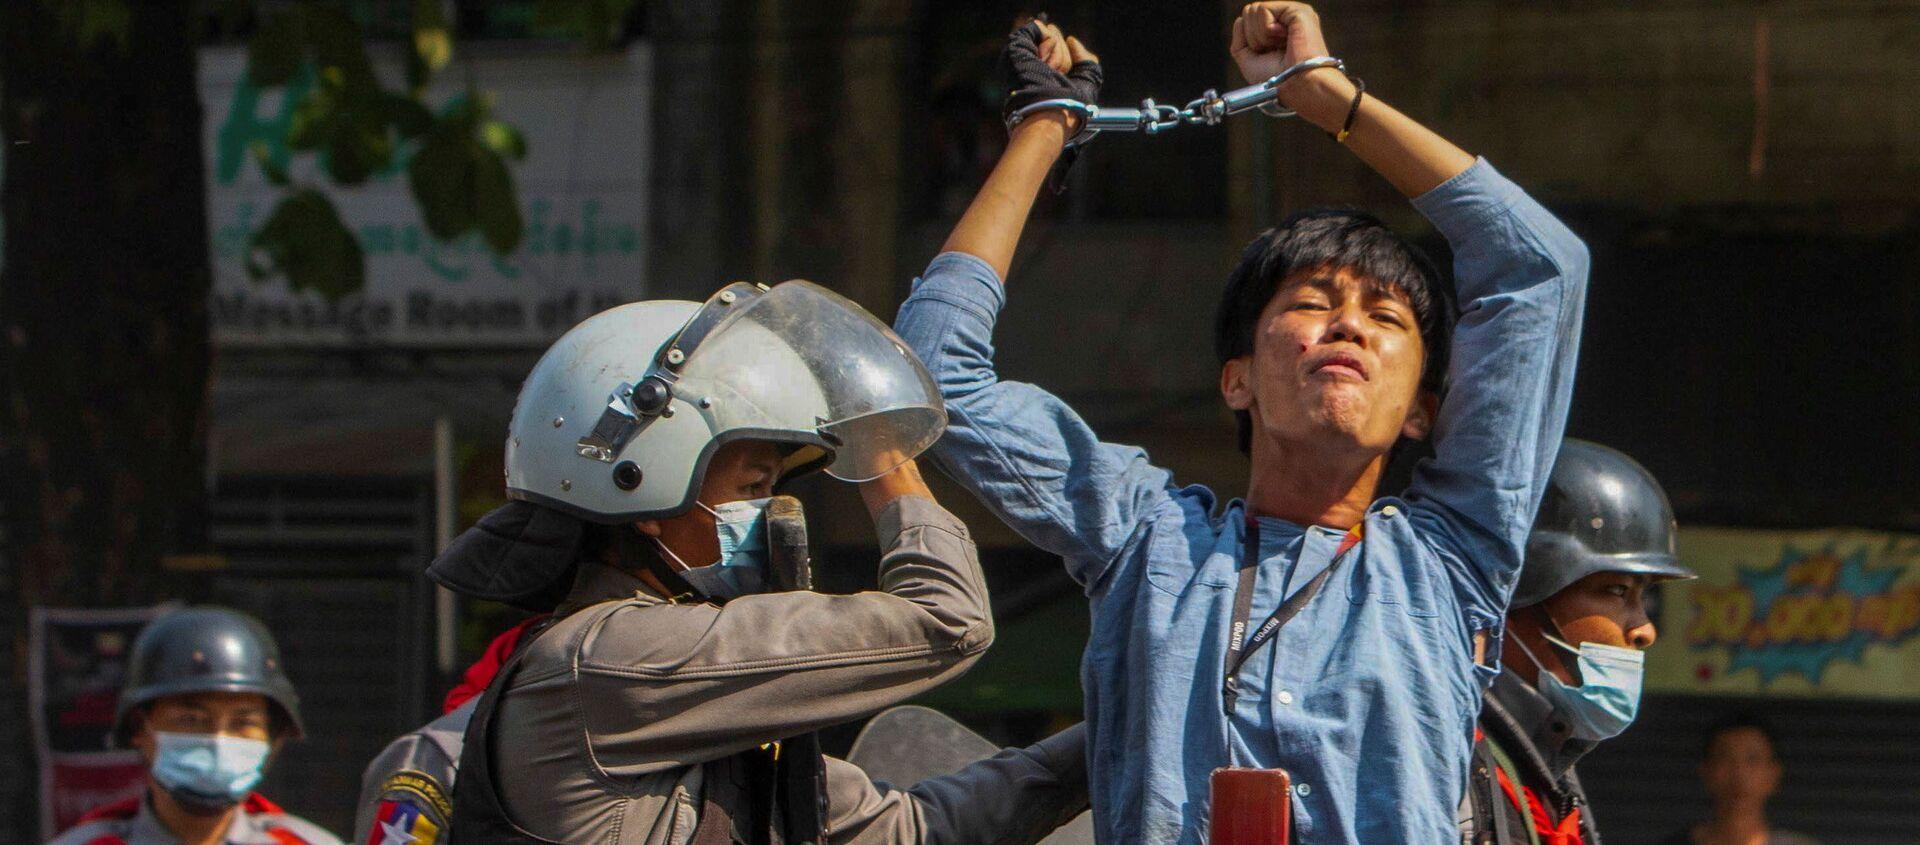 Un manifestante arrestato in Myanmar - Sputnik Italia, 1920, 11.03.2021